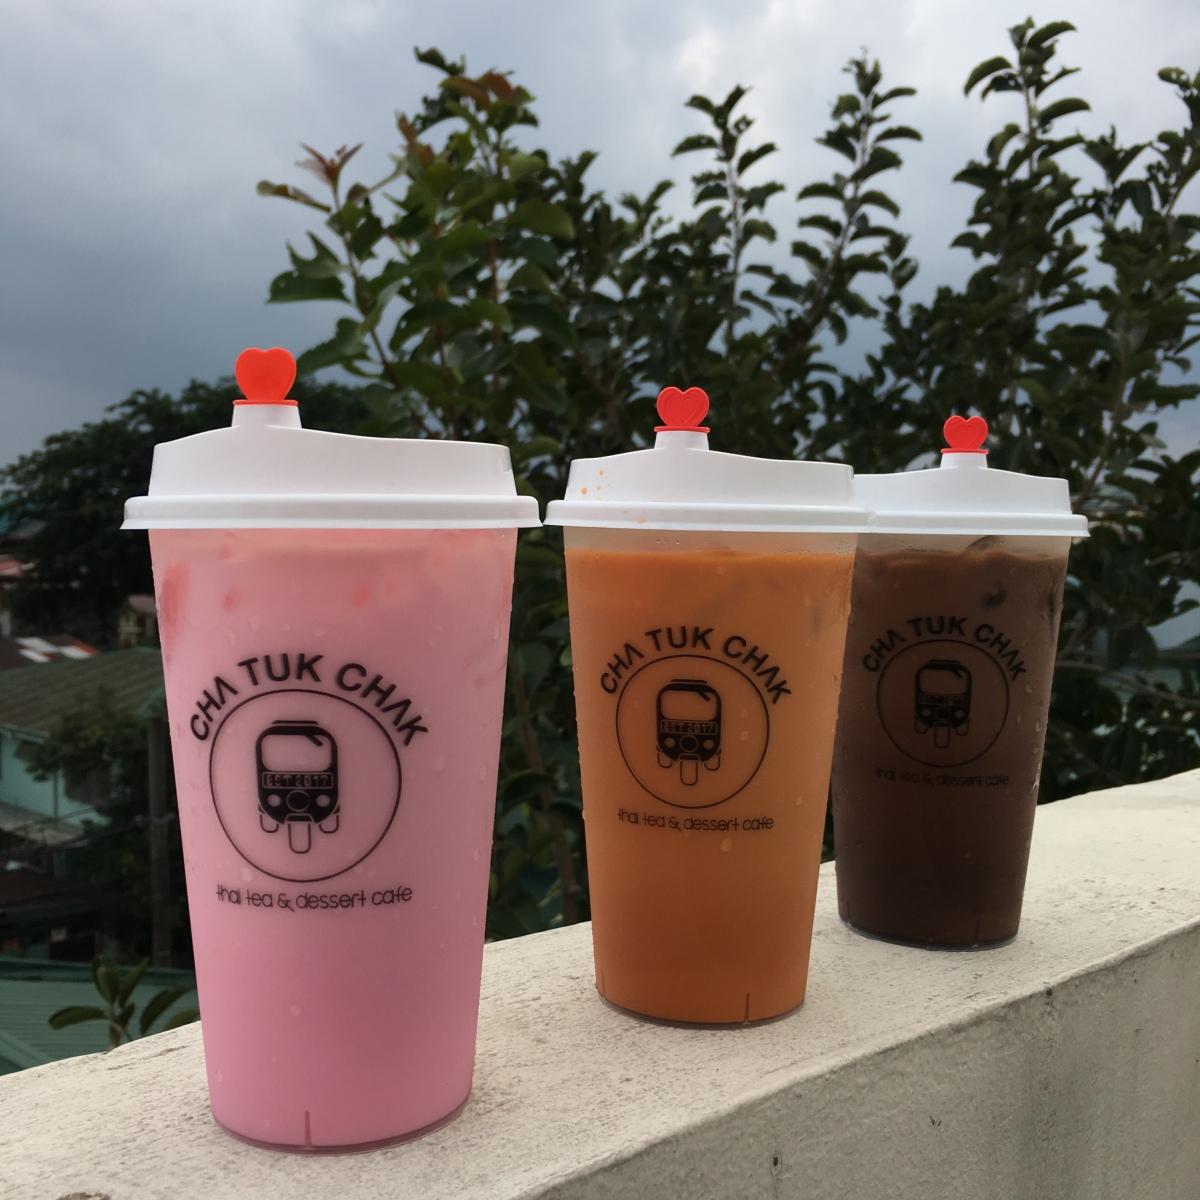 Thai Milk Tea at Cha Tuk Chak,Greenhills